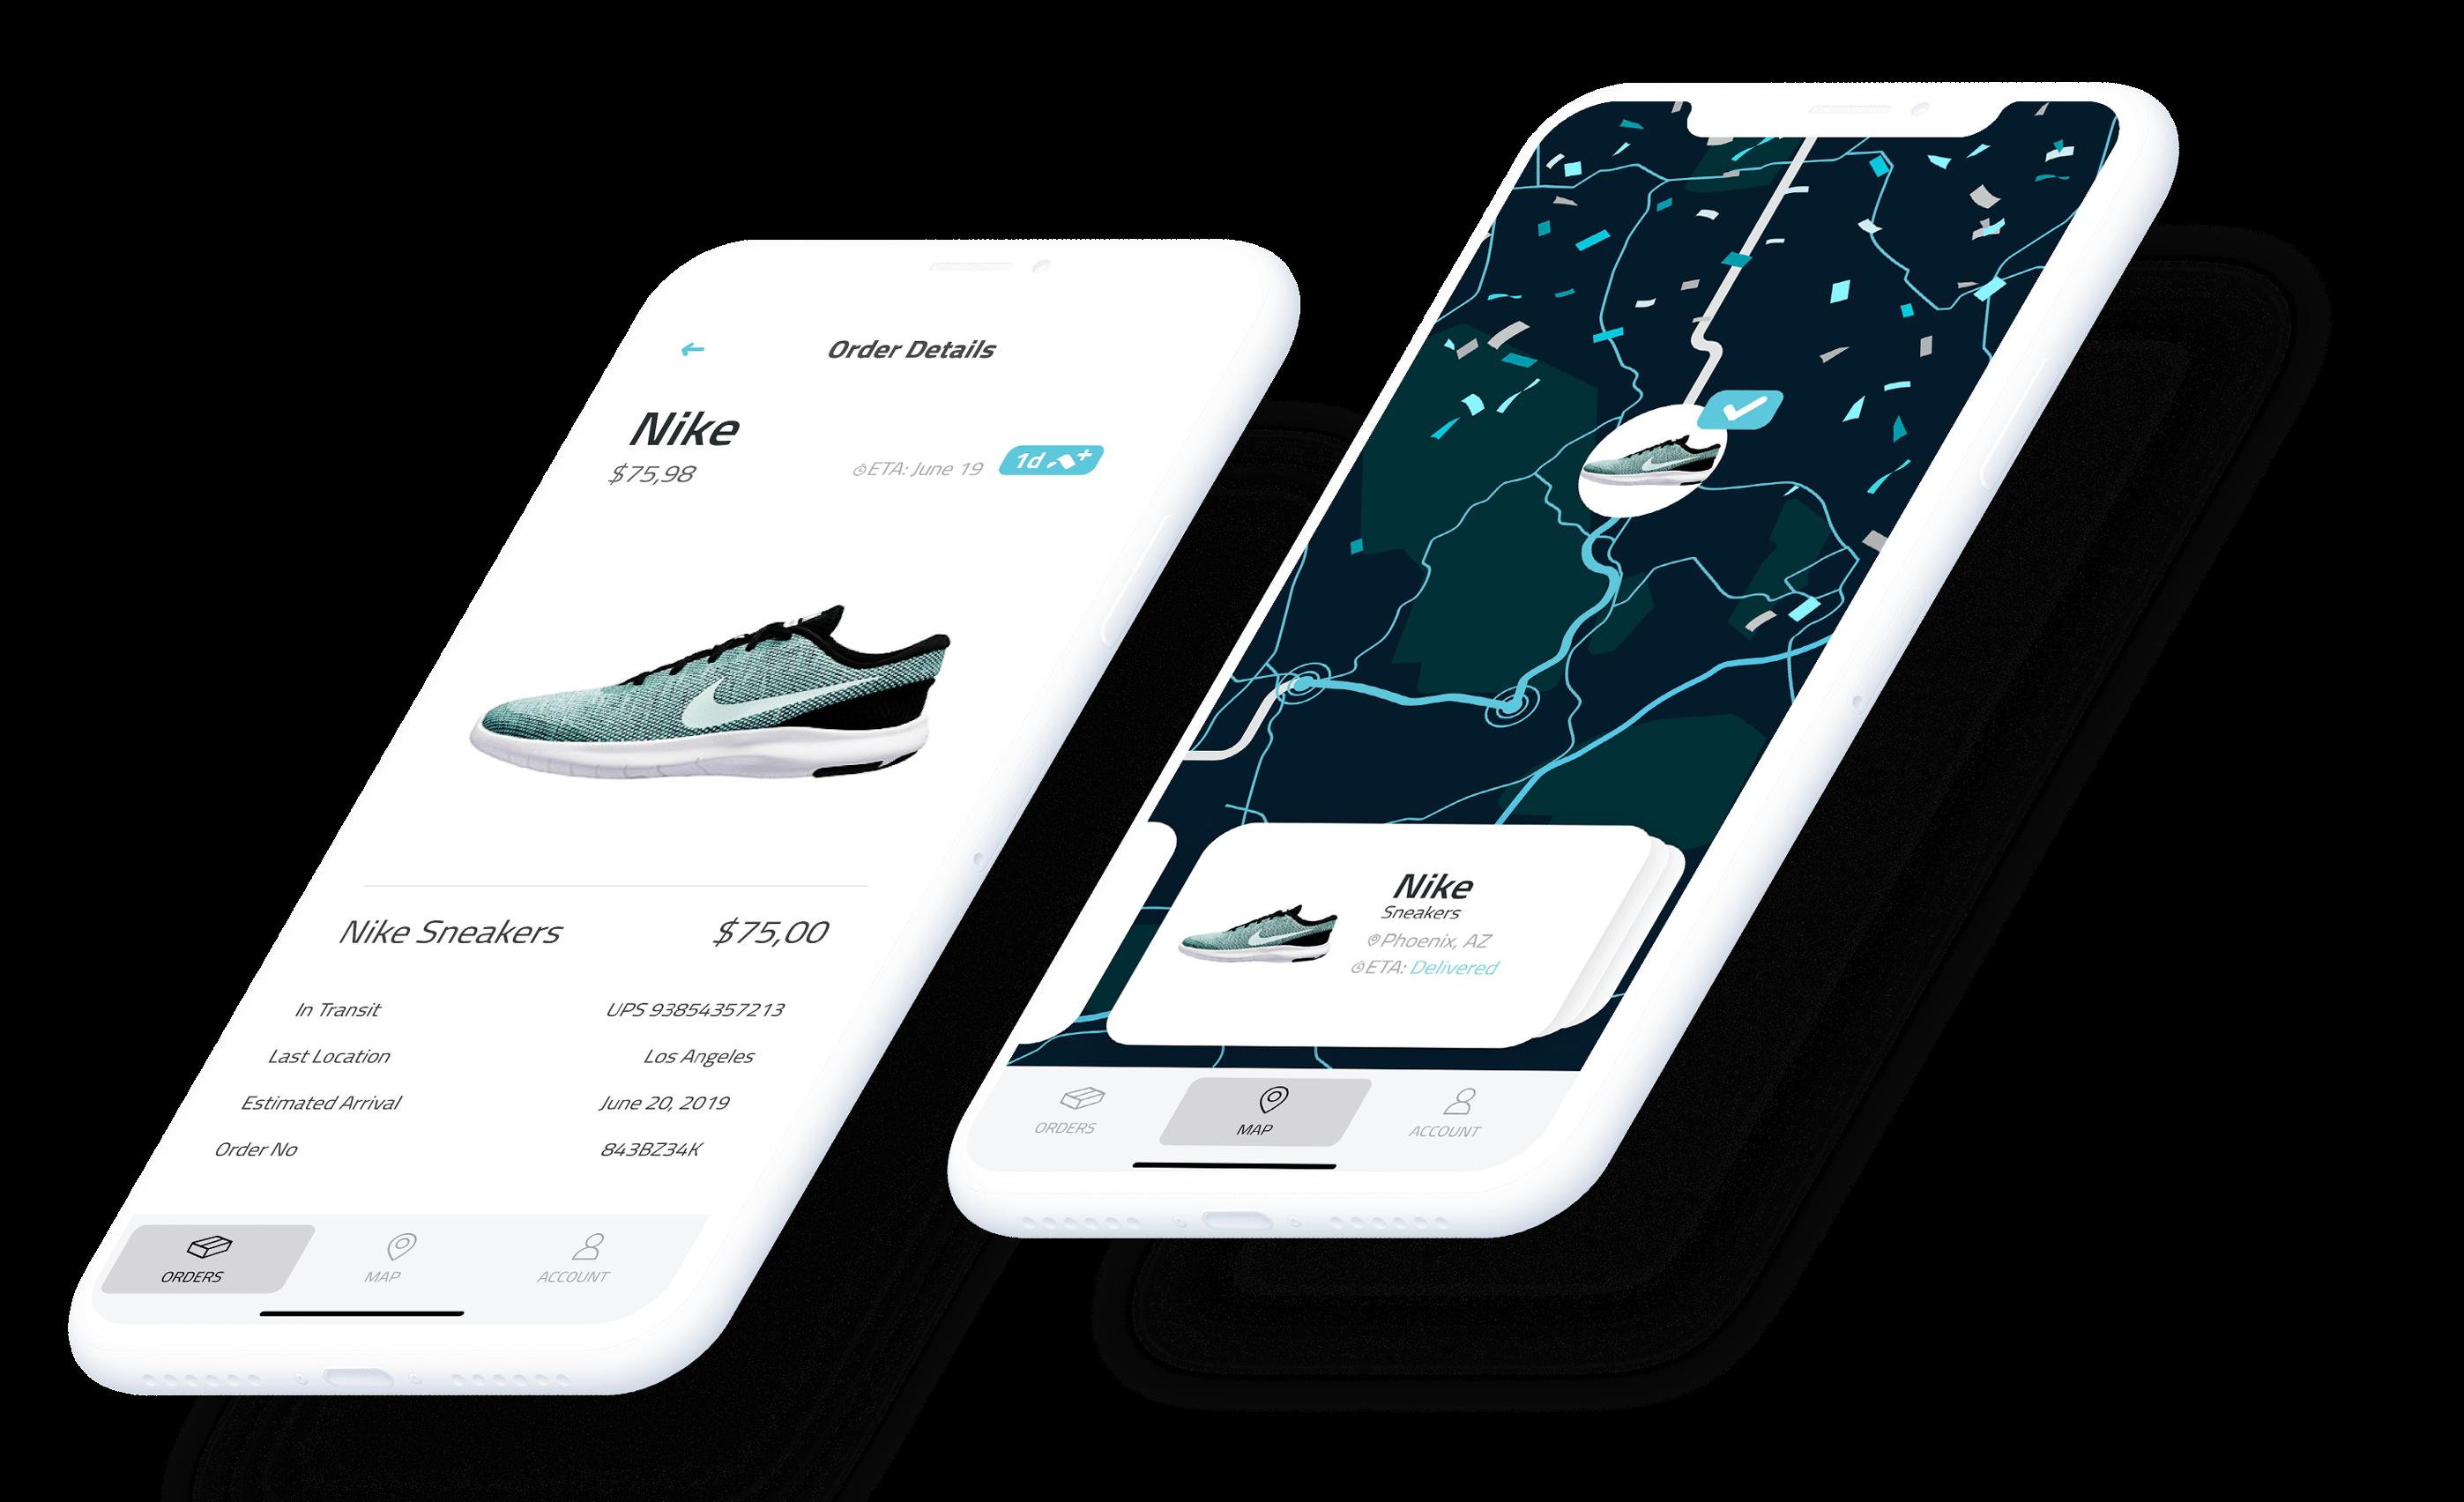 Route's app auto-tracks all your packages, raises $12M